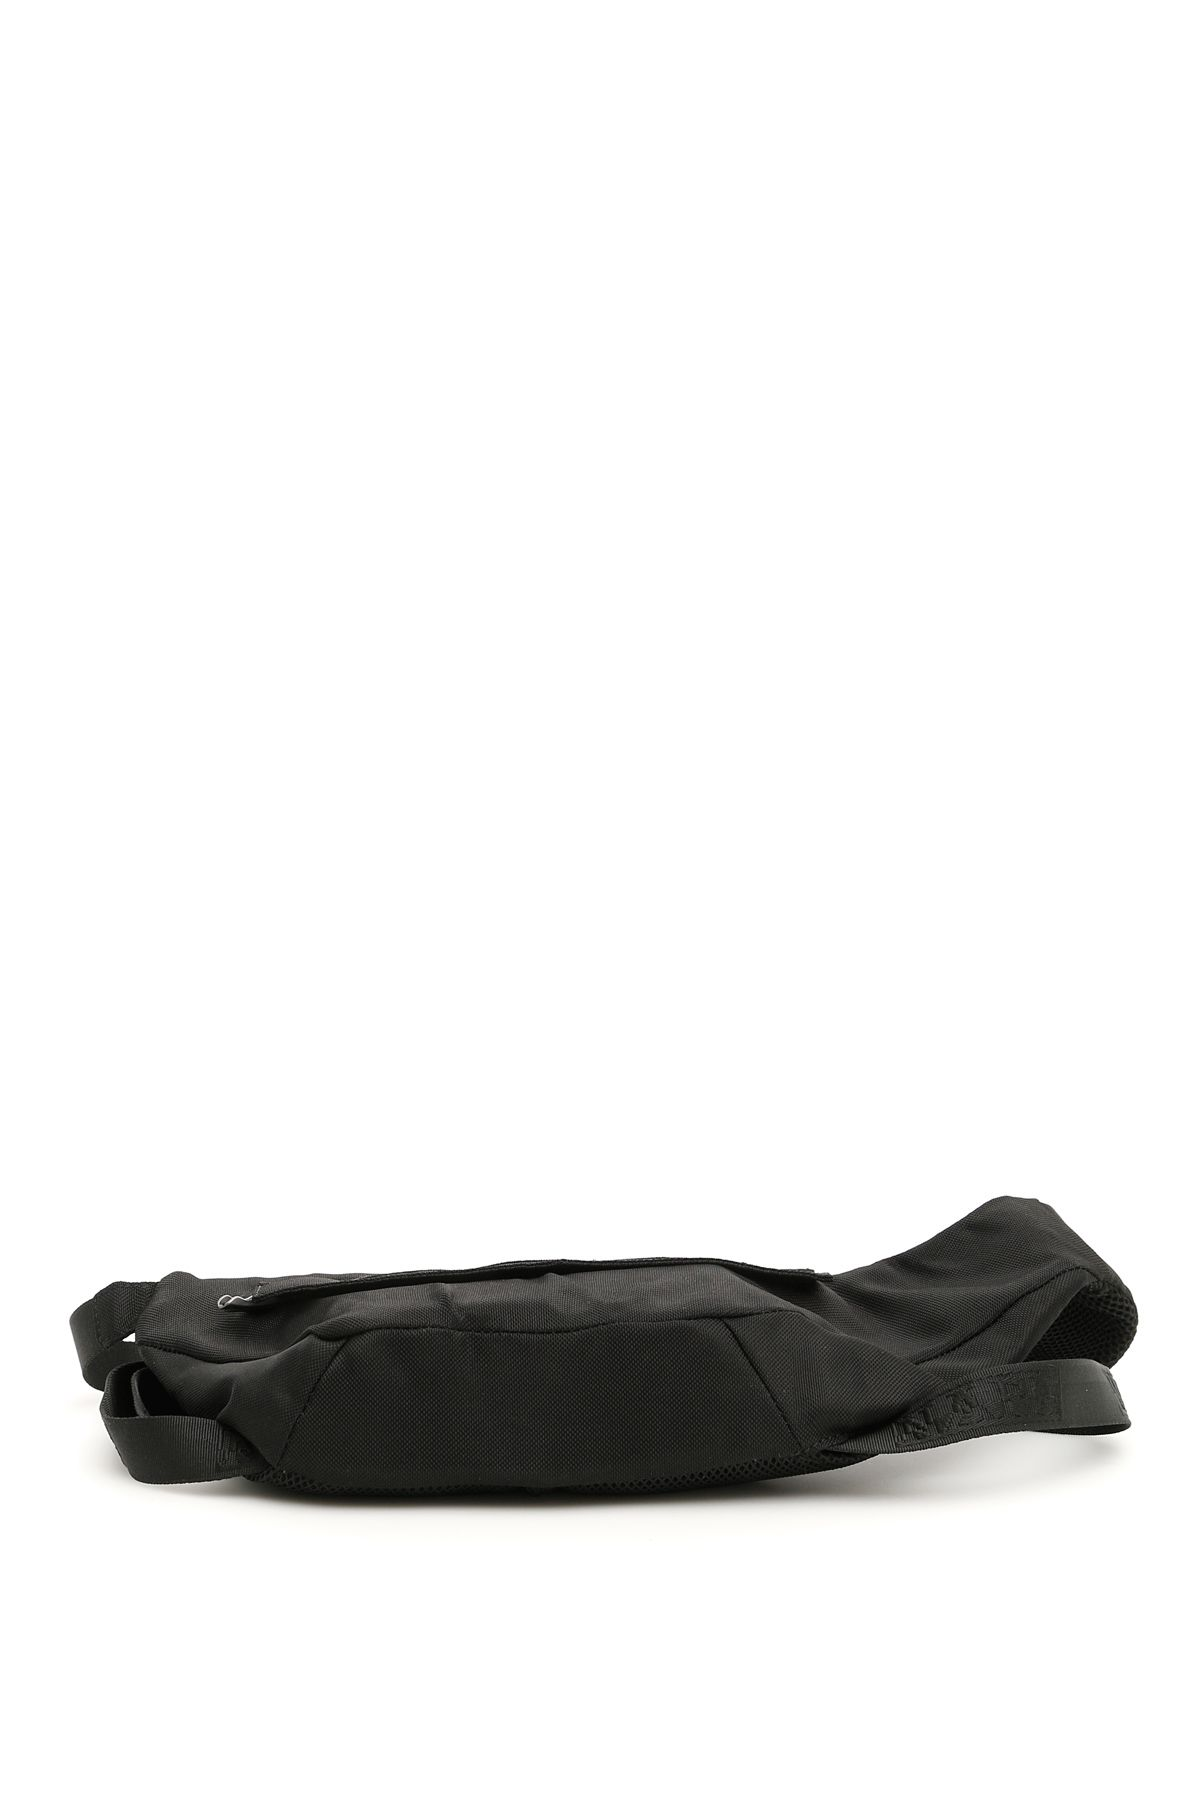 a74917ce8fd2 Napa By Martine Rose Napa By Martine Rose Nylon Beltbag - BLACK